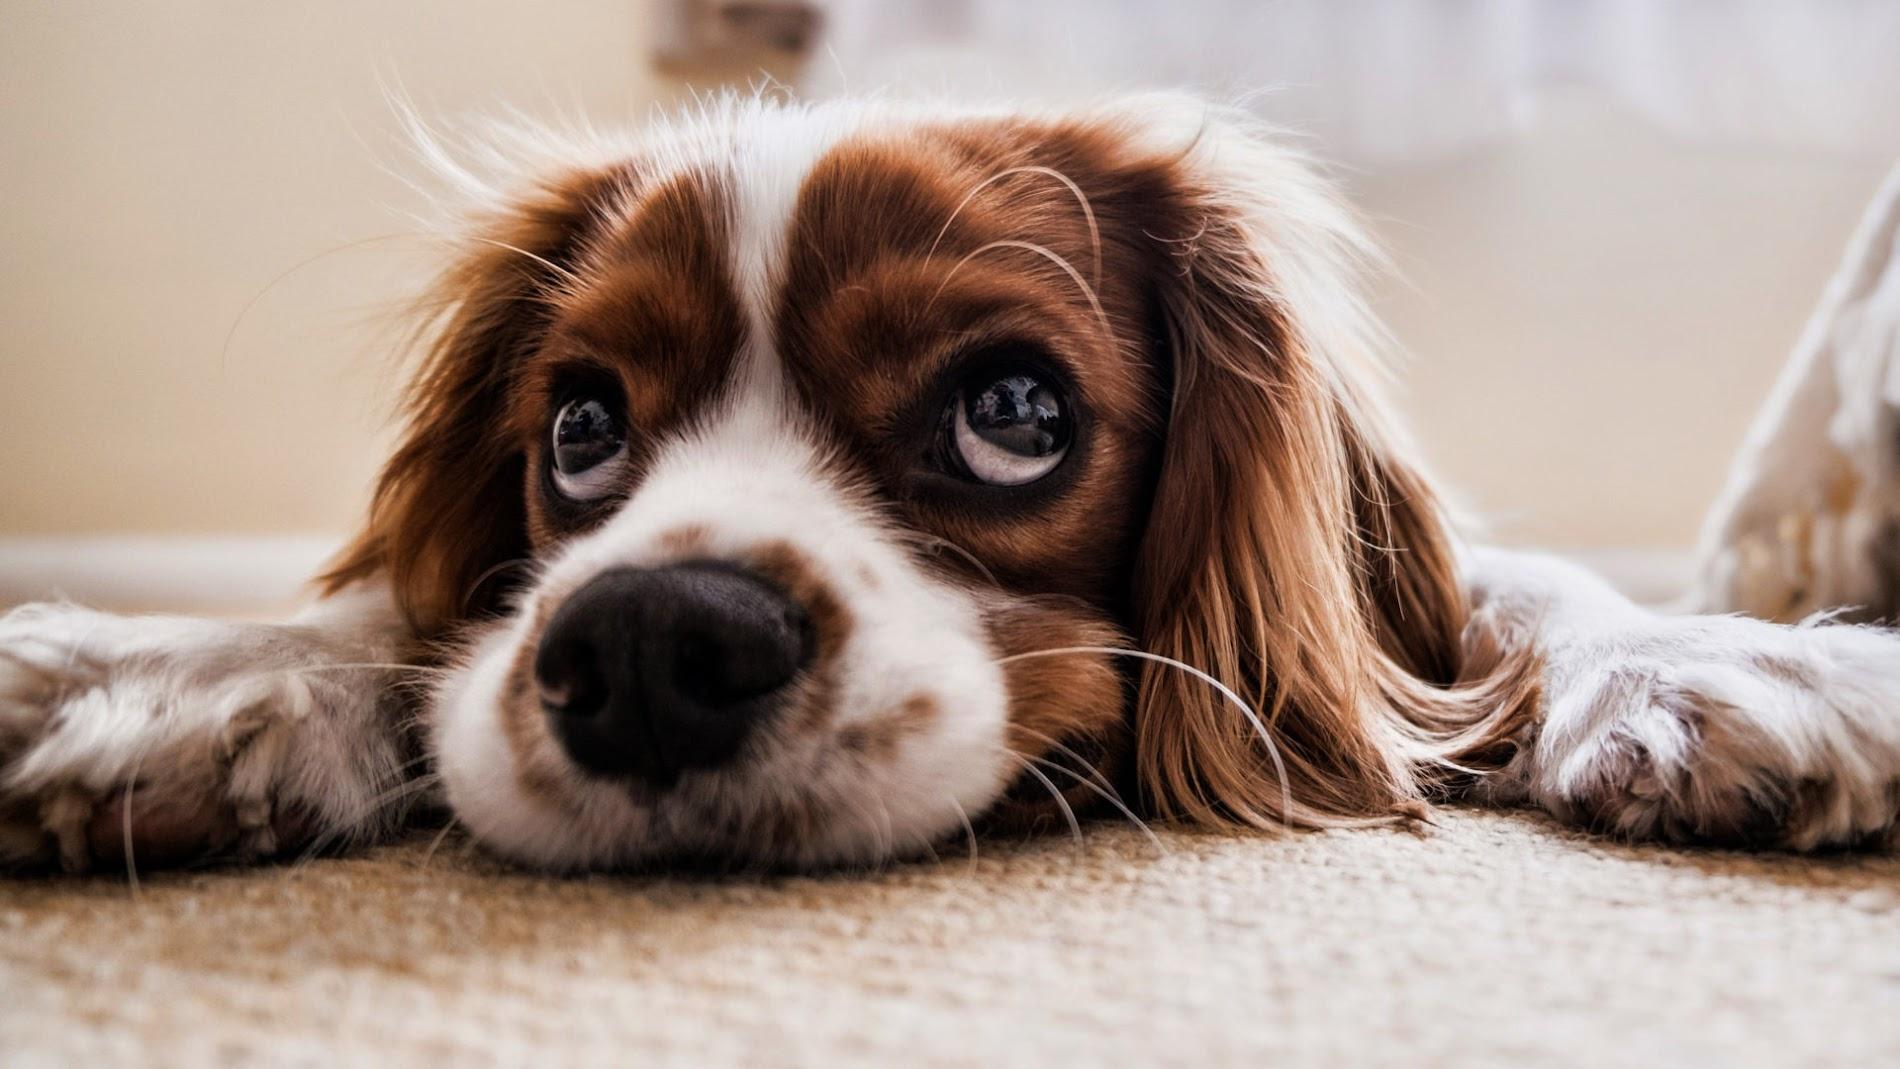 Cute Puppy HD Wallpaper